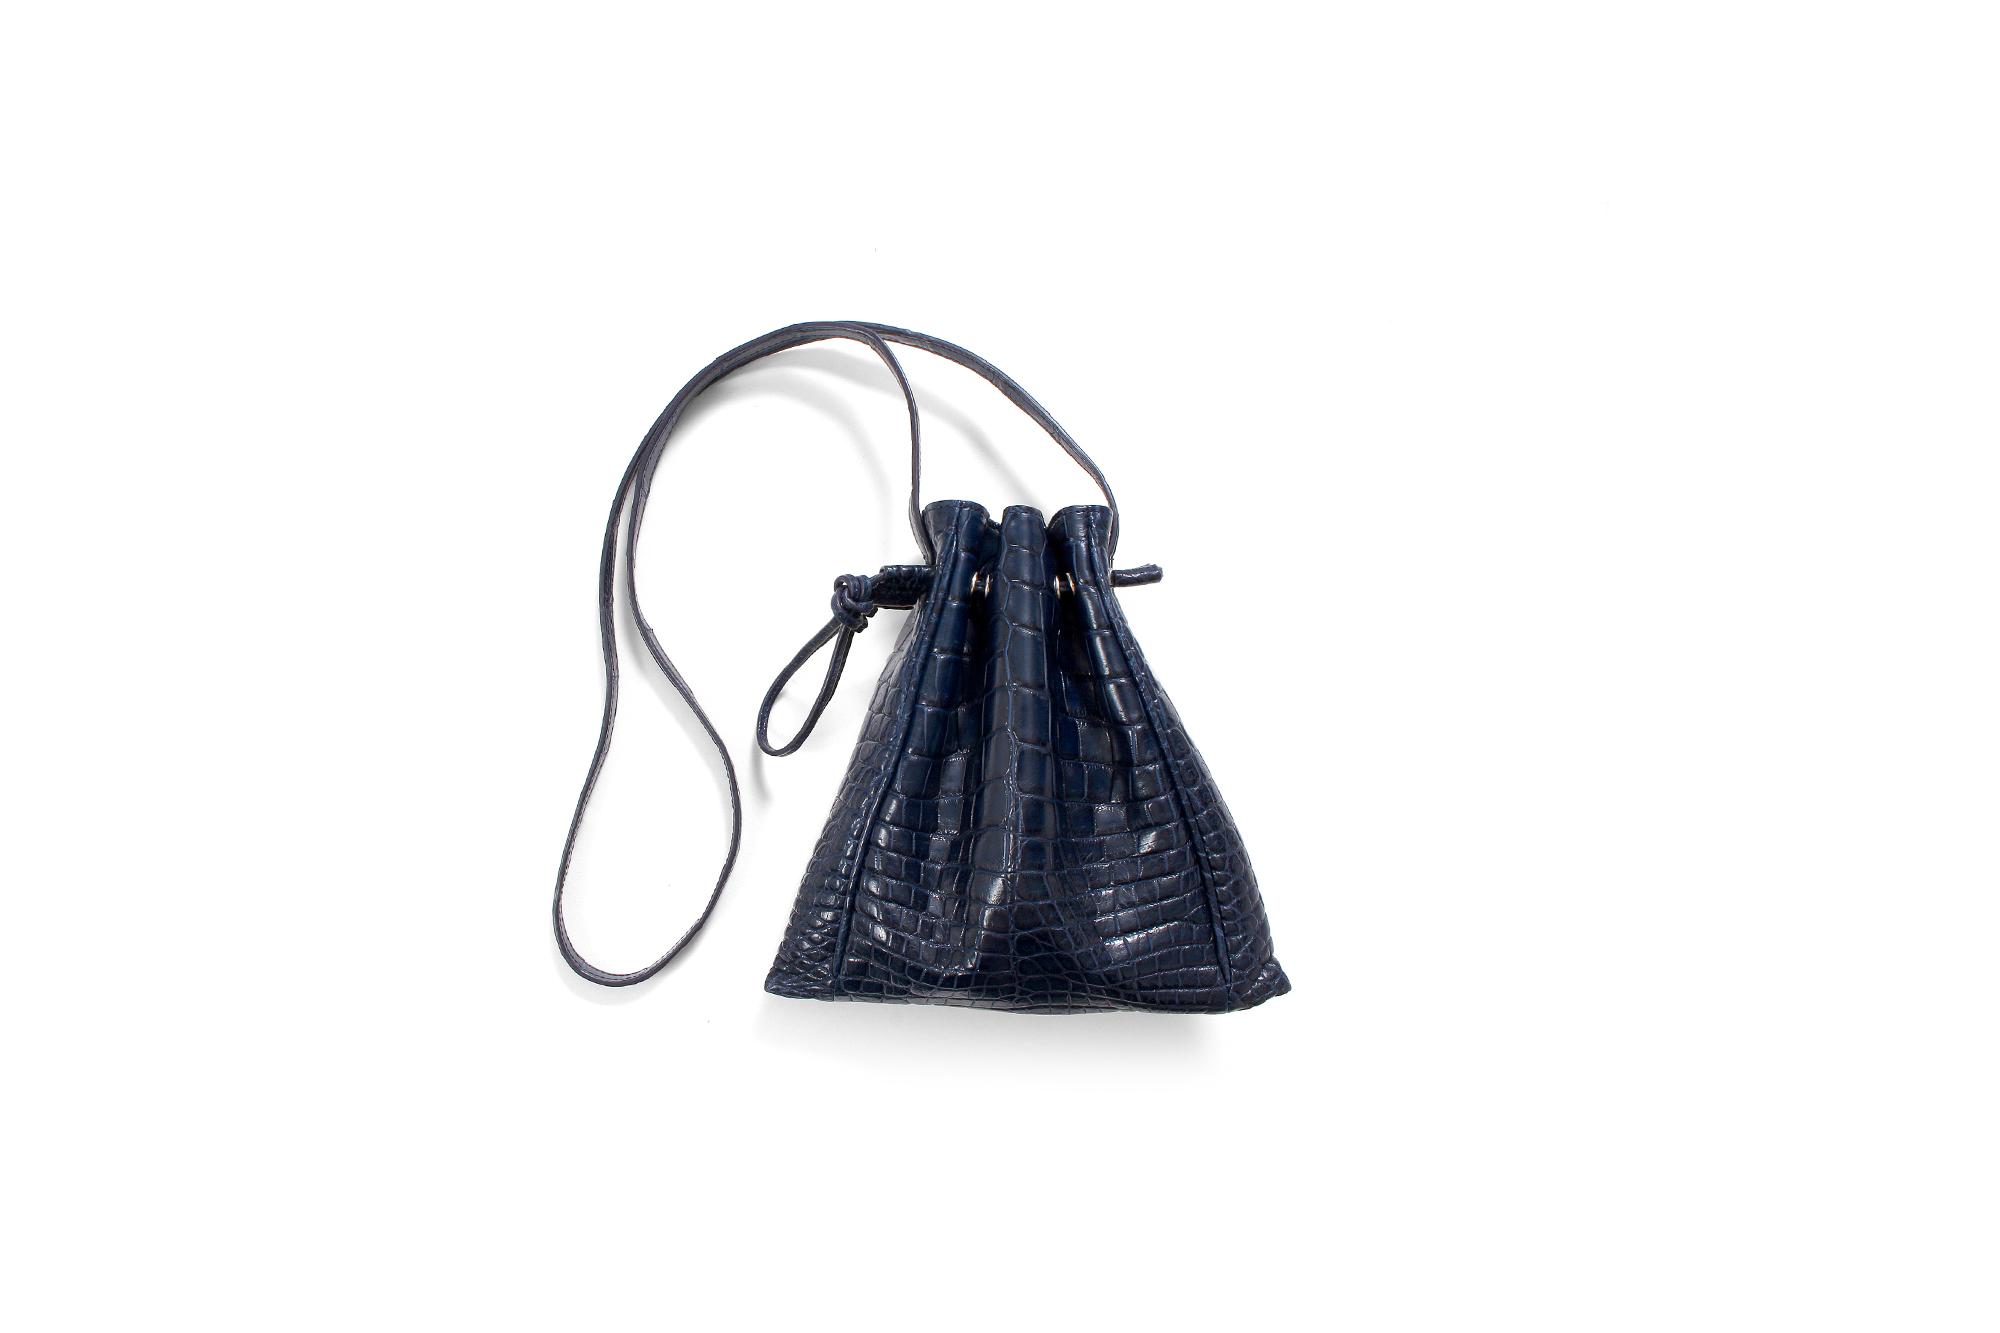 cuervo bopoha(クエルボ ヴァローナ) FLOYD(フロイド) Crocodile Leather(クロコダイルレザー) レザードローストリングバック 巾着 NAVY (ネイビー) Made in Japan(日本製) 2020【Special Model】 愛知 名古屋 altoediritto アルトエデリット